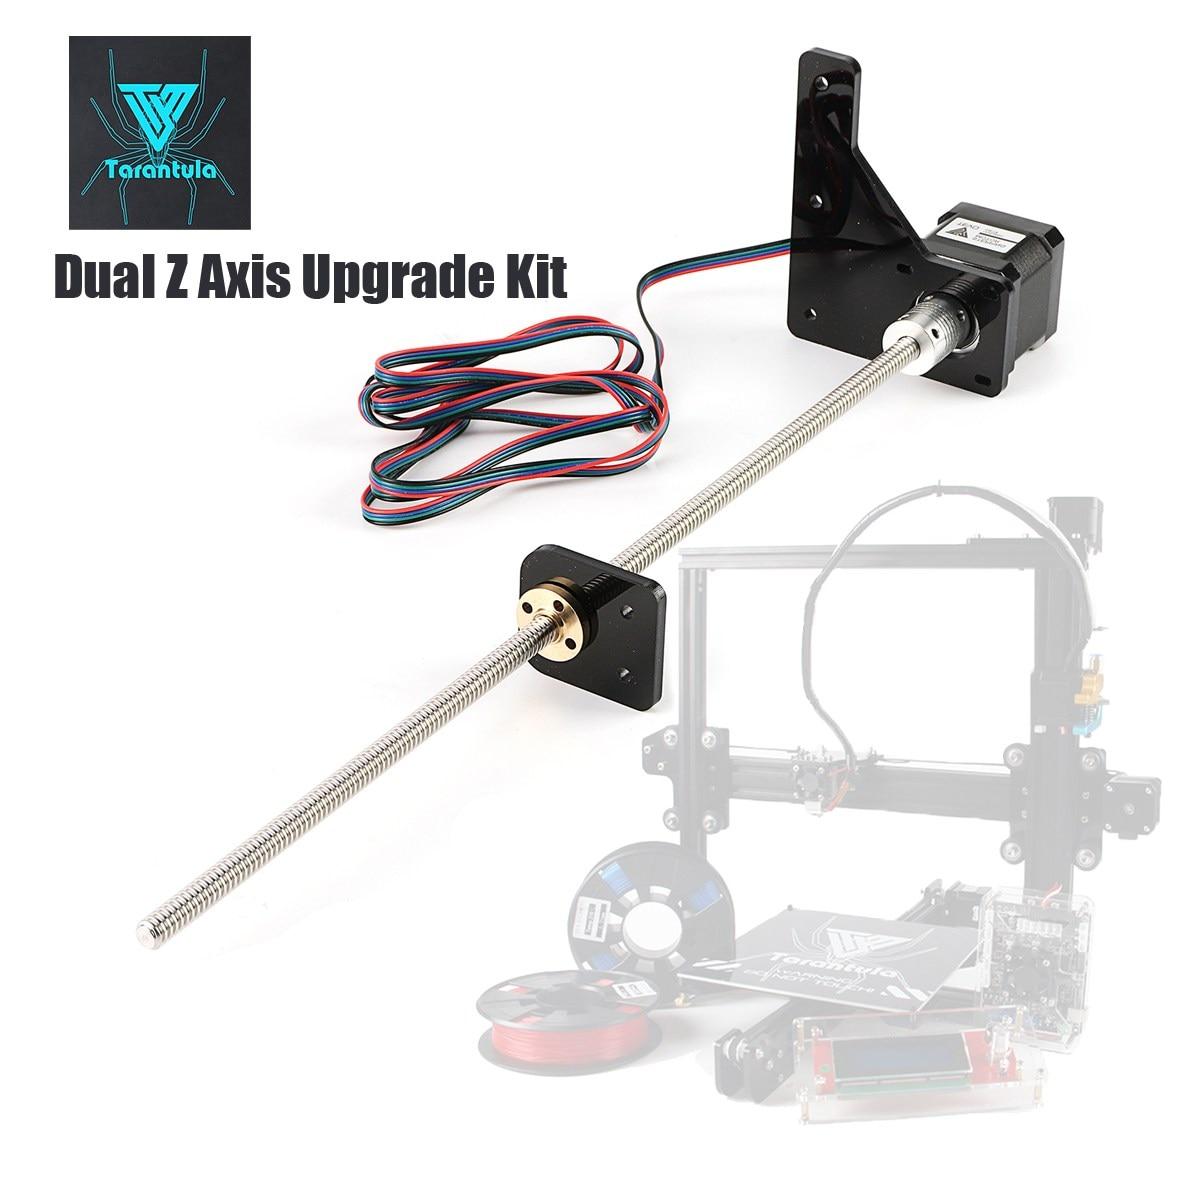 TEVO Tarantula Dual Z Axis Upgrade Kit Nema 42 Step Motor and T8 2 Lead Screw